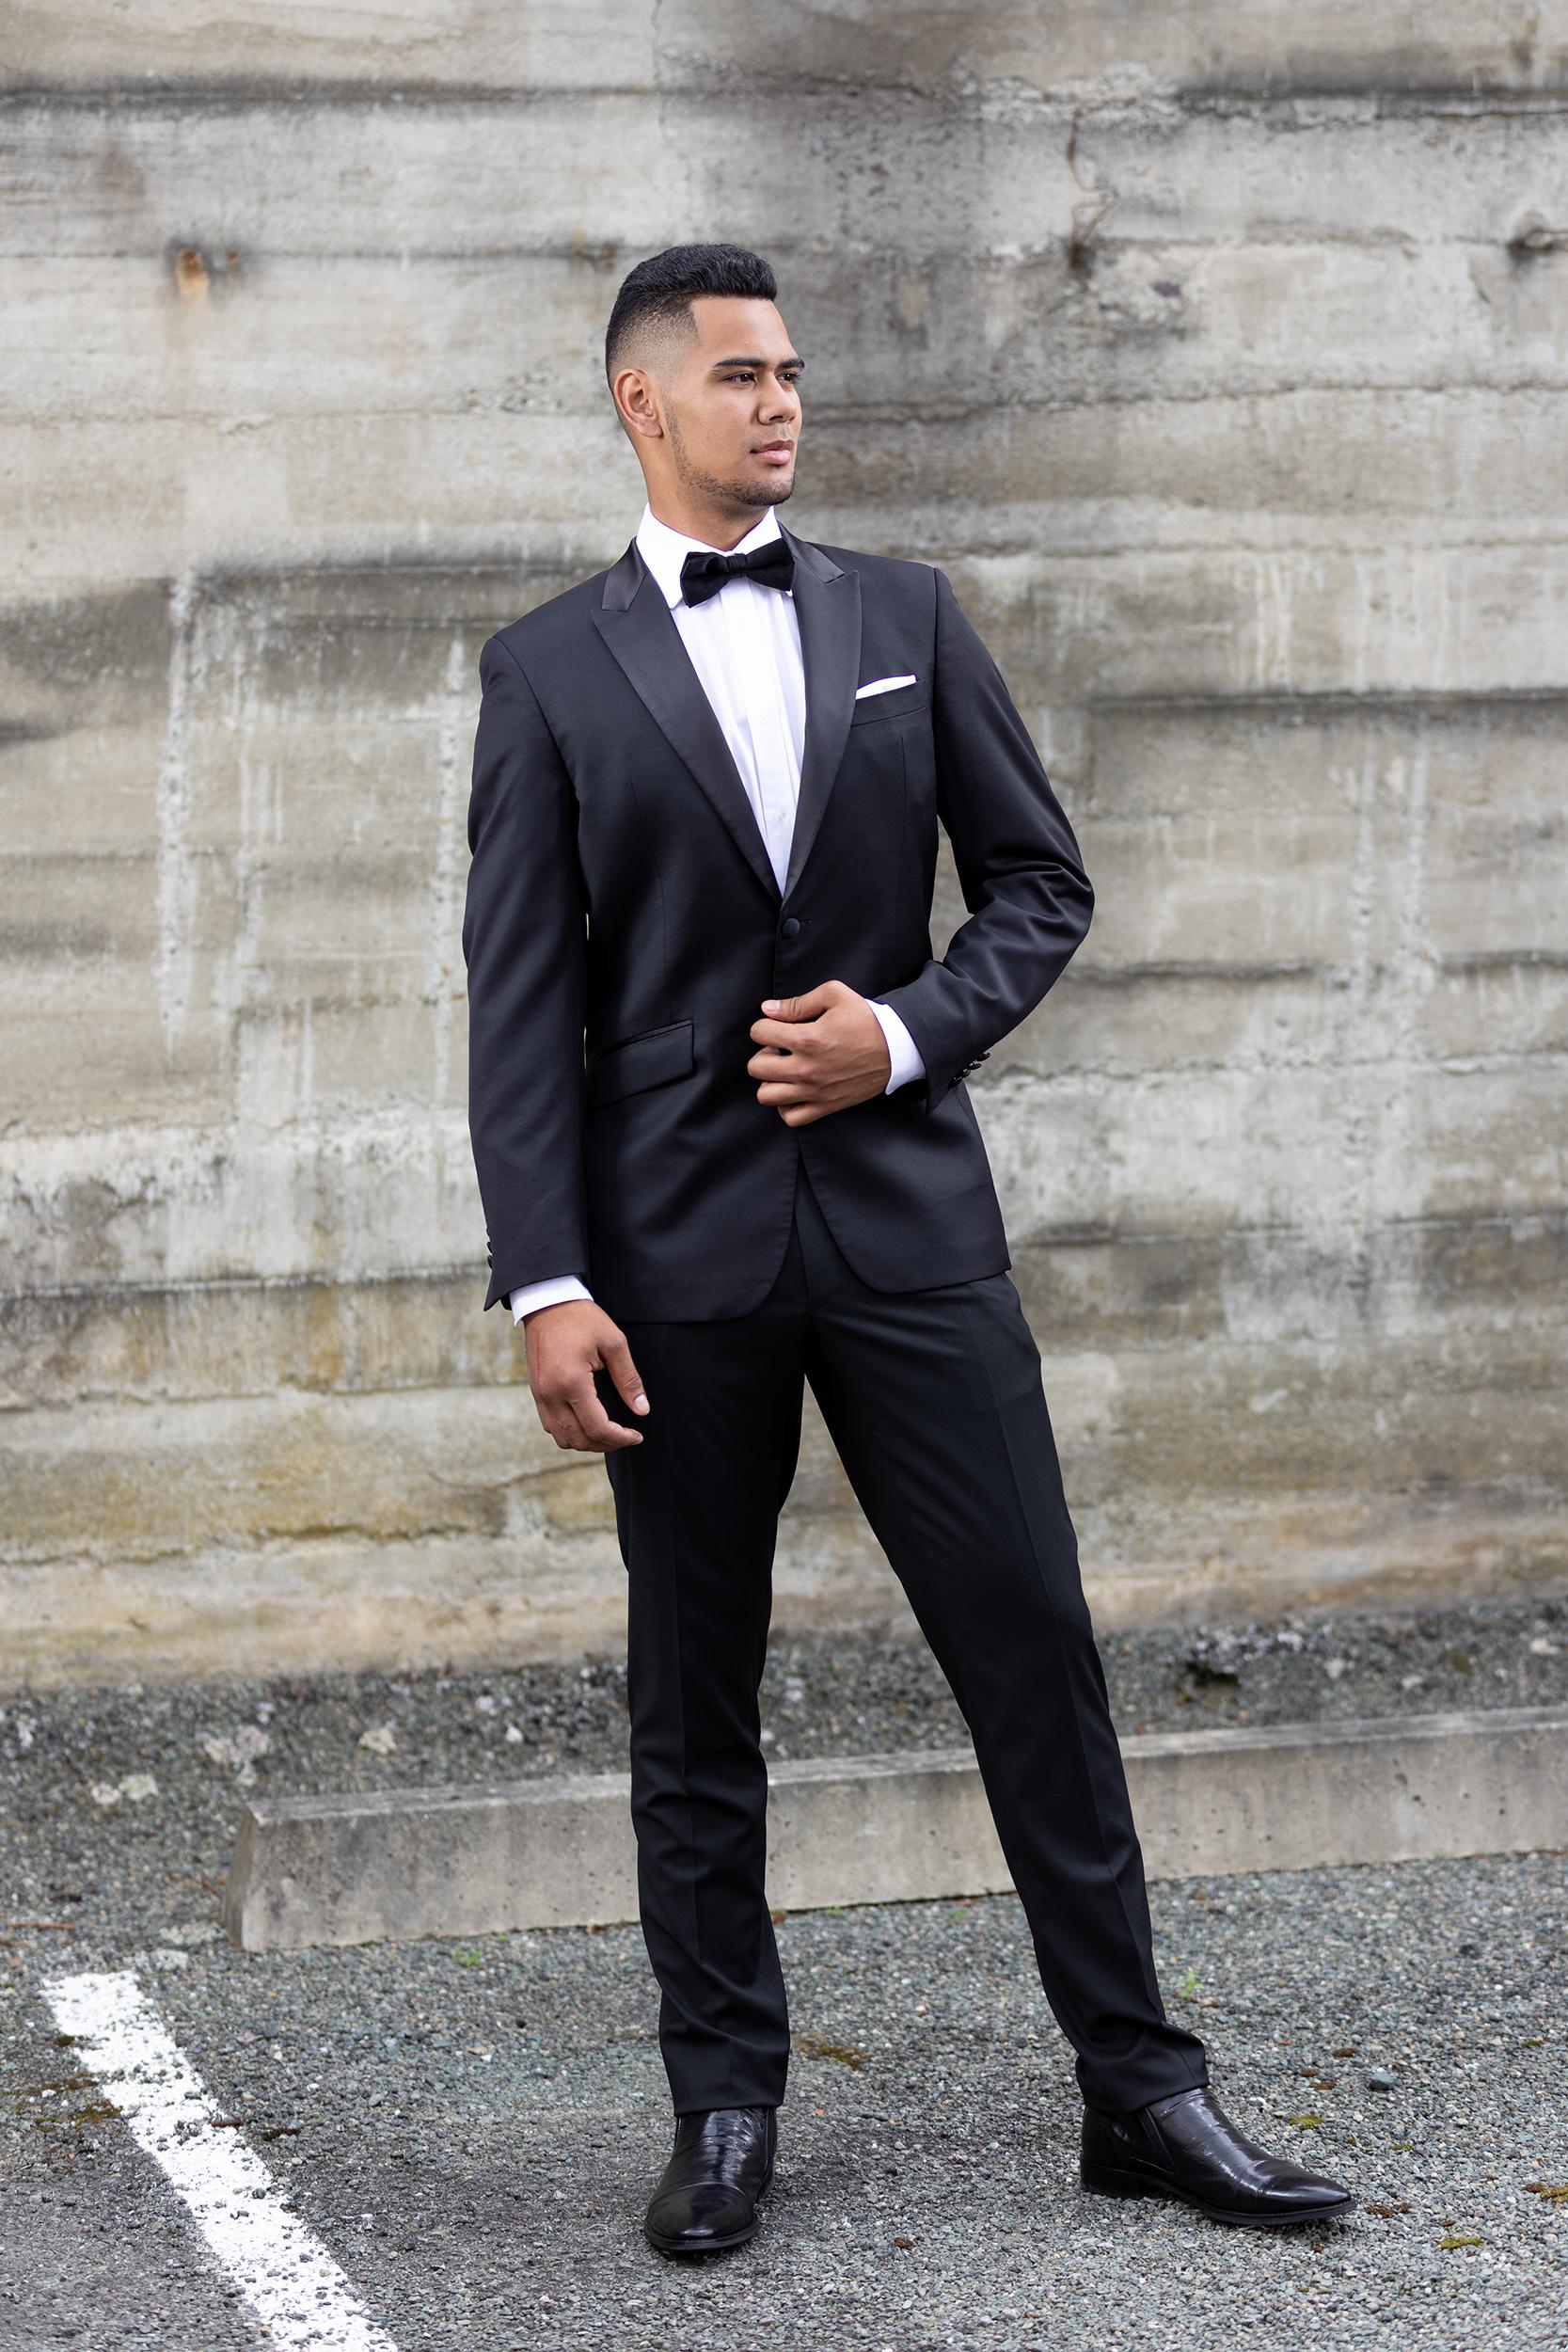 Oscar - Regular Fit- Peak lapel with satin finish- 2 button suit jacket- Straight leg suit trouserHire price $120 NZDReg: 88—132Short: 88—116Tall: 92—116